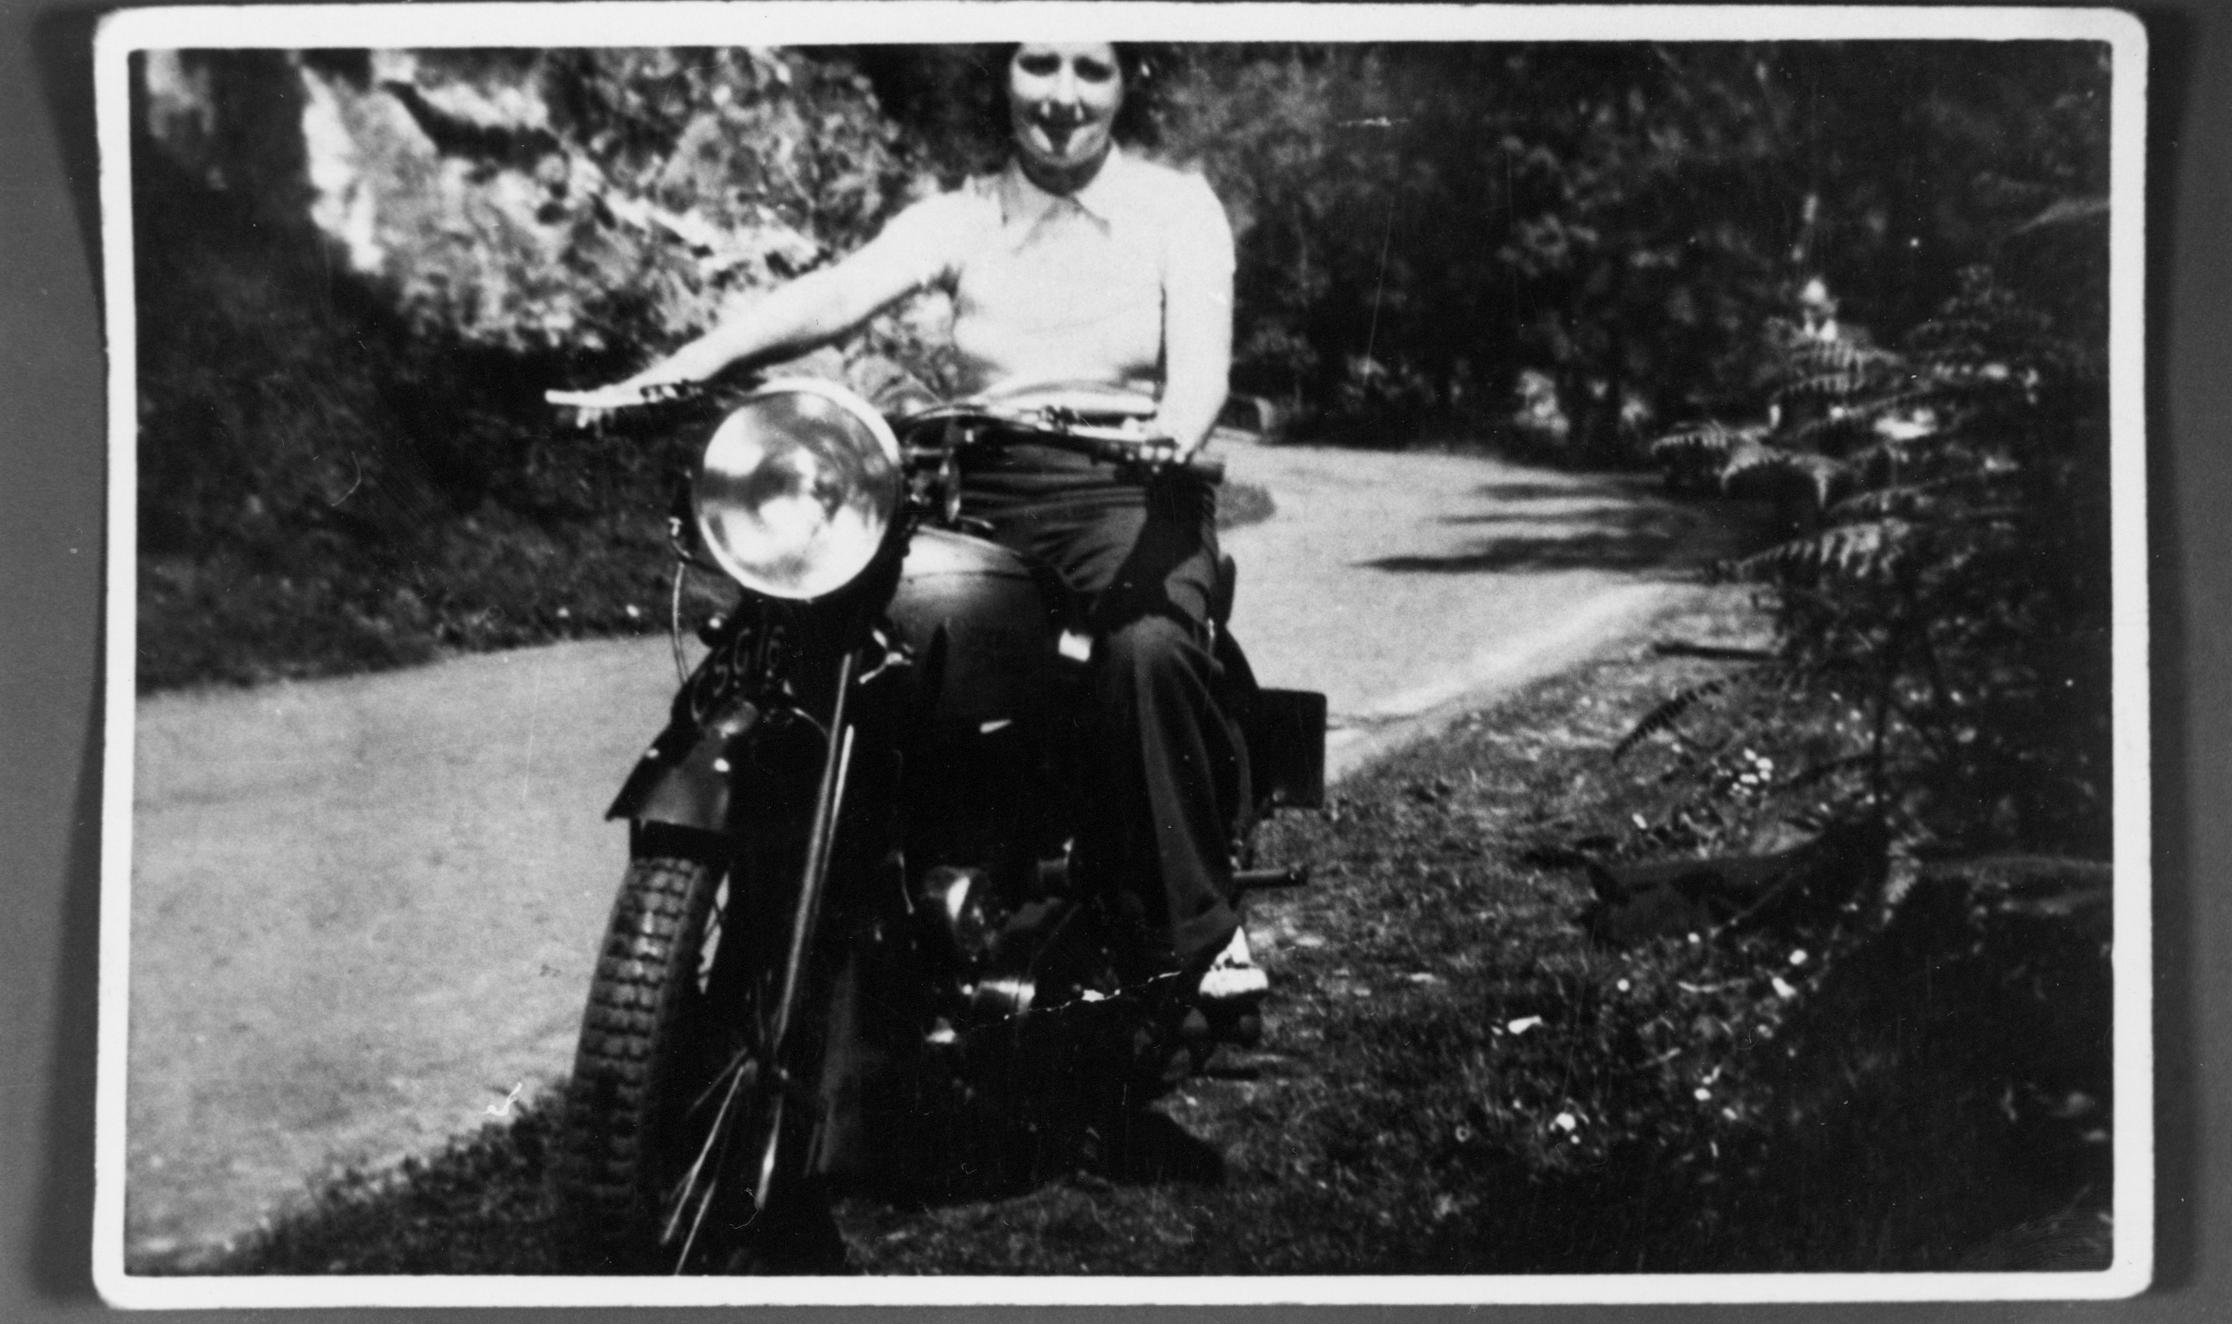 Woman On Royal Enfield Motorbike 1938